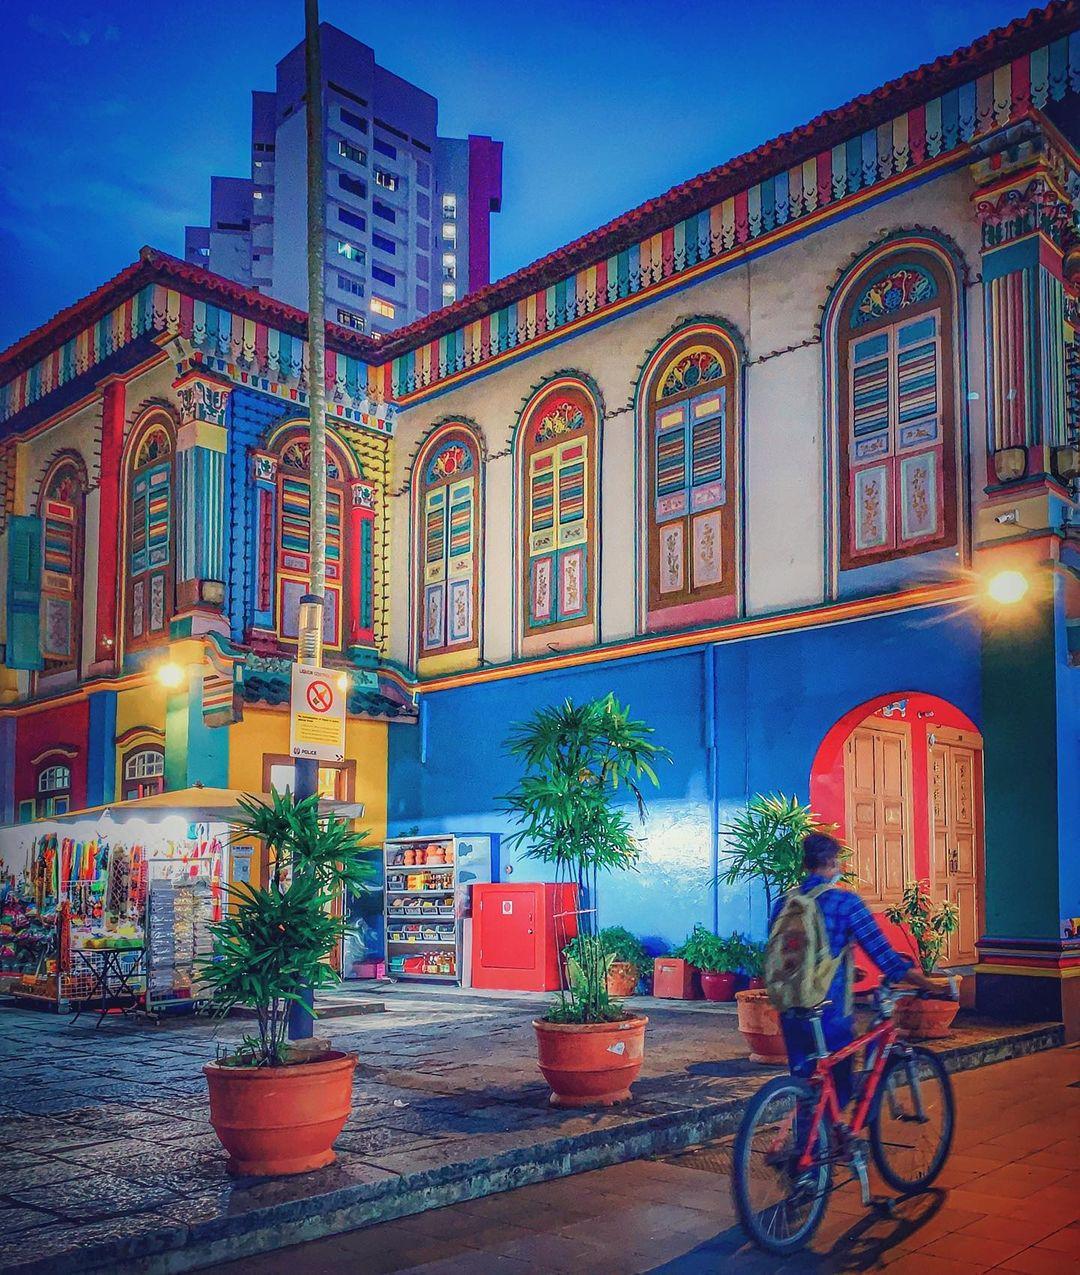 History of Tan Teng Niah House